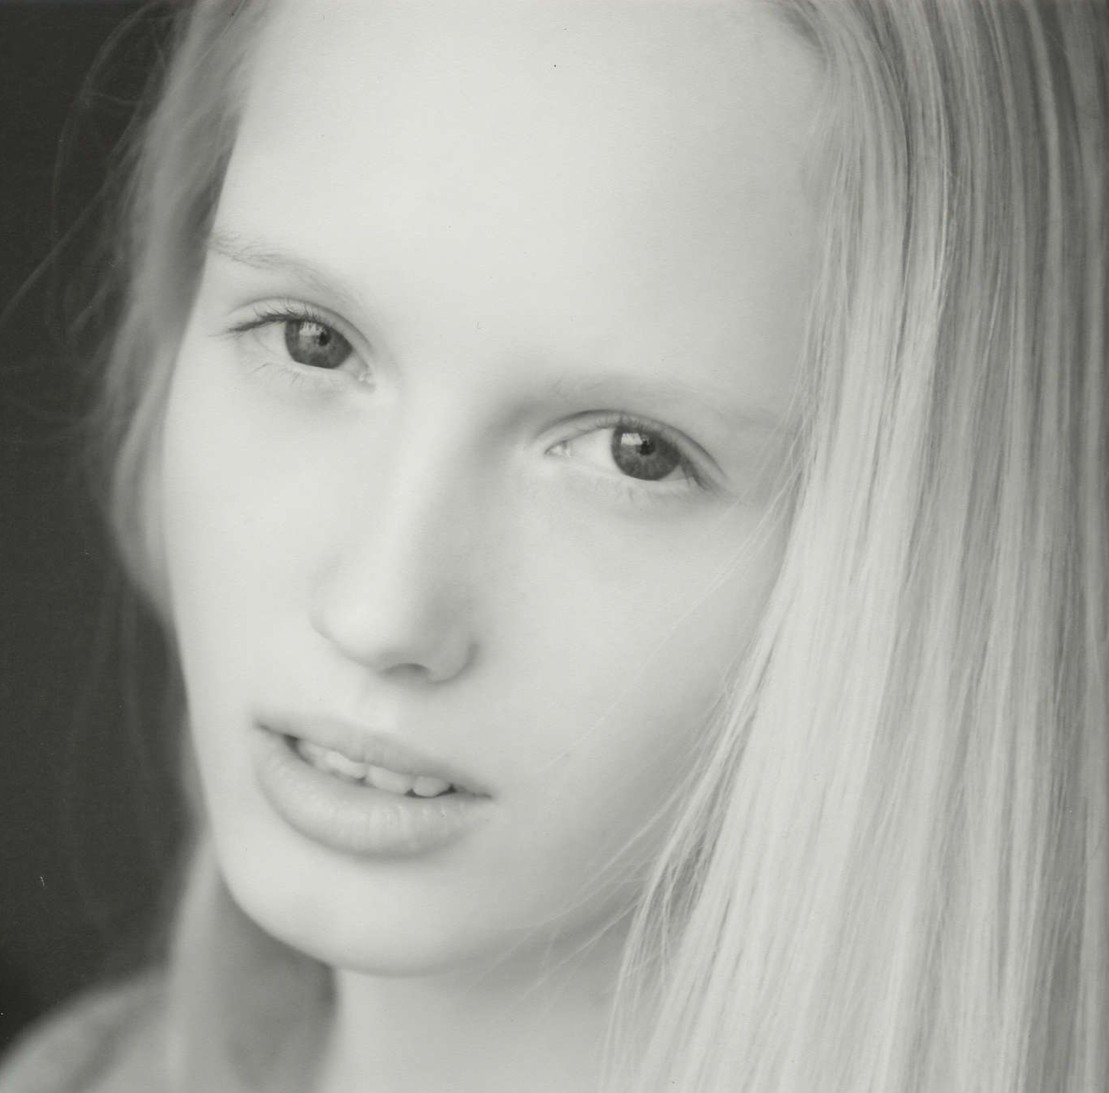 Daria Model   newhairstylesformen2014.com